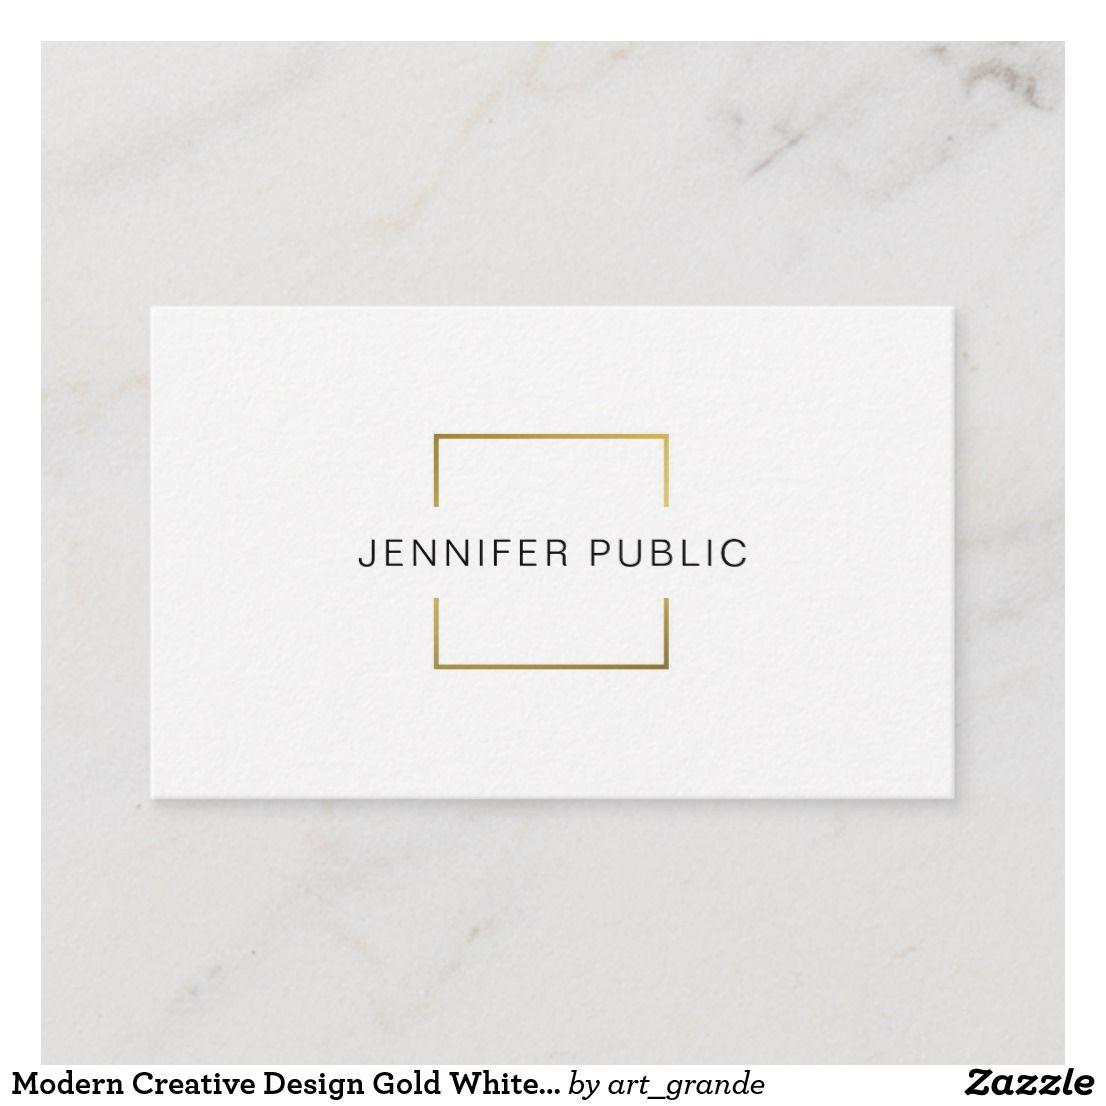 Modern Creative Design Gold White Professional Business Card